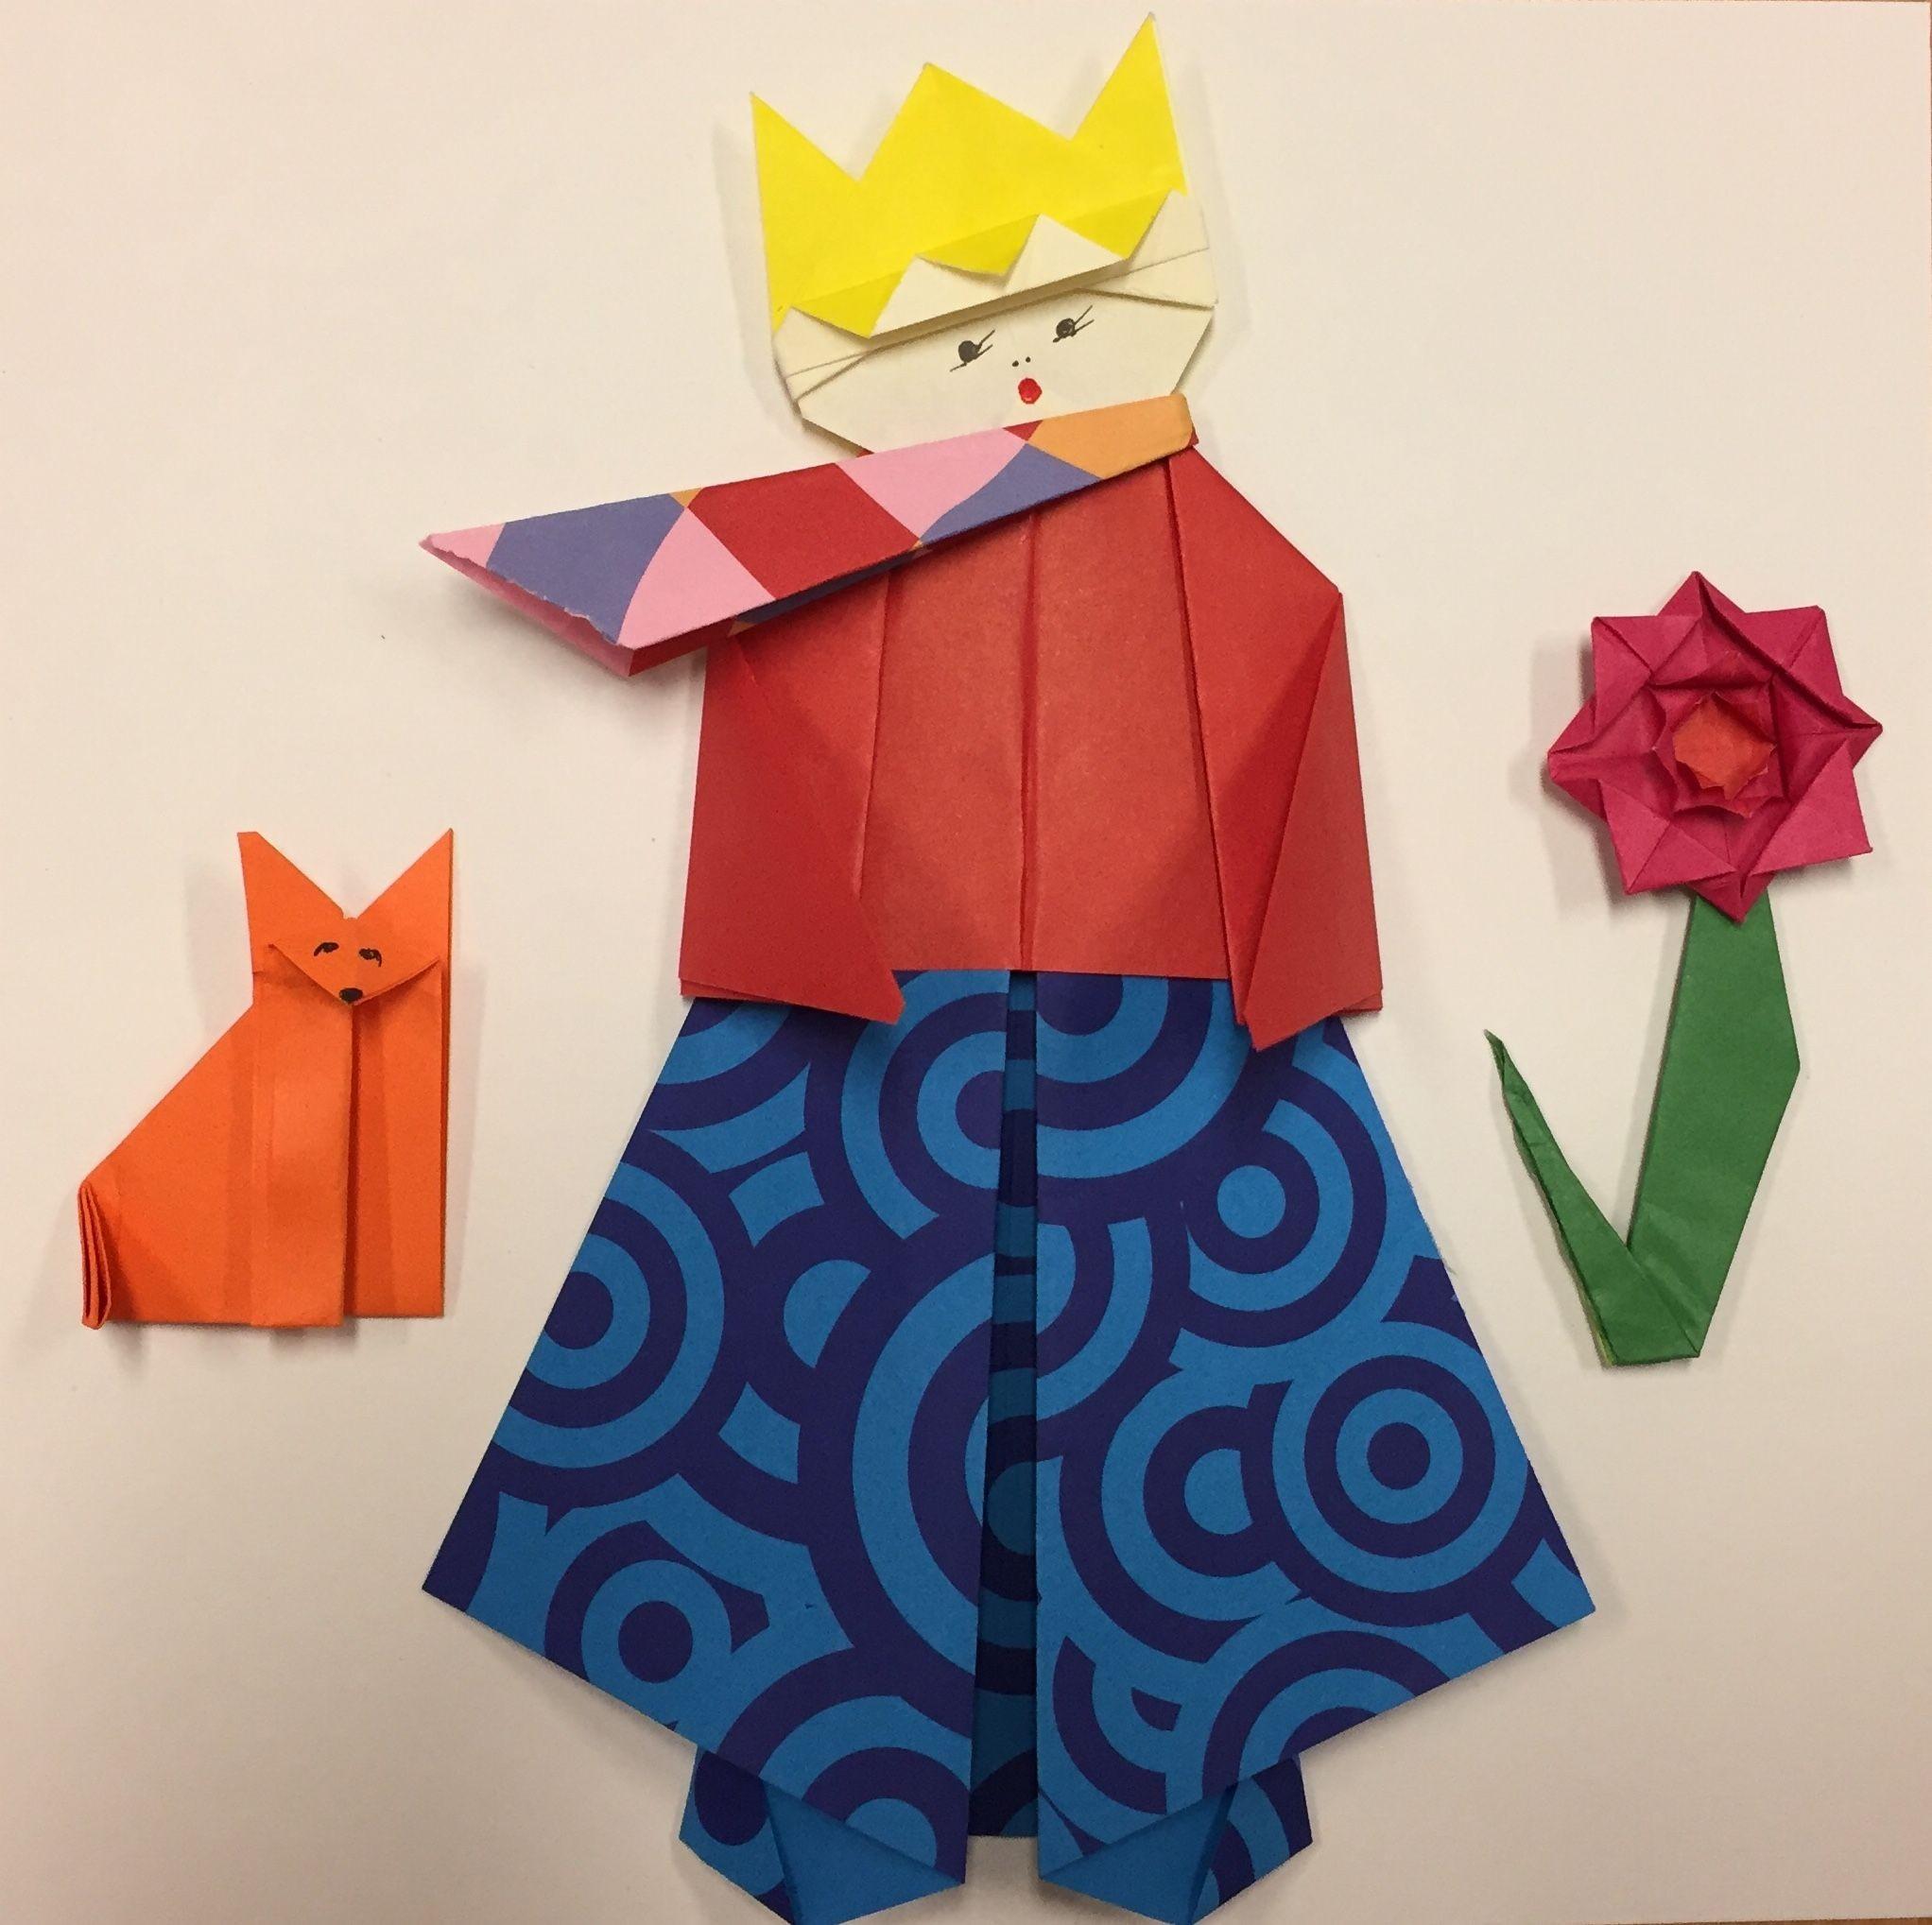 Papercraft Frog origami Literario El Principito 👑🌹 origami Literario